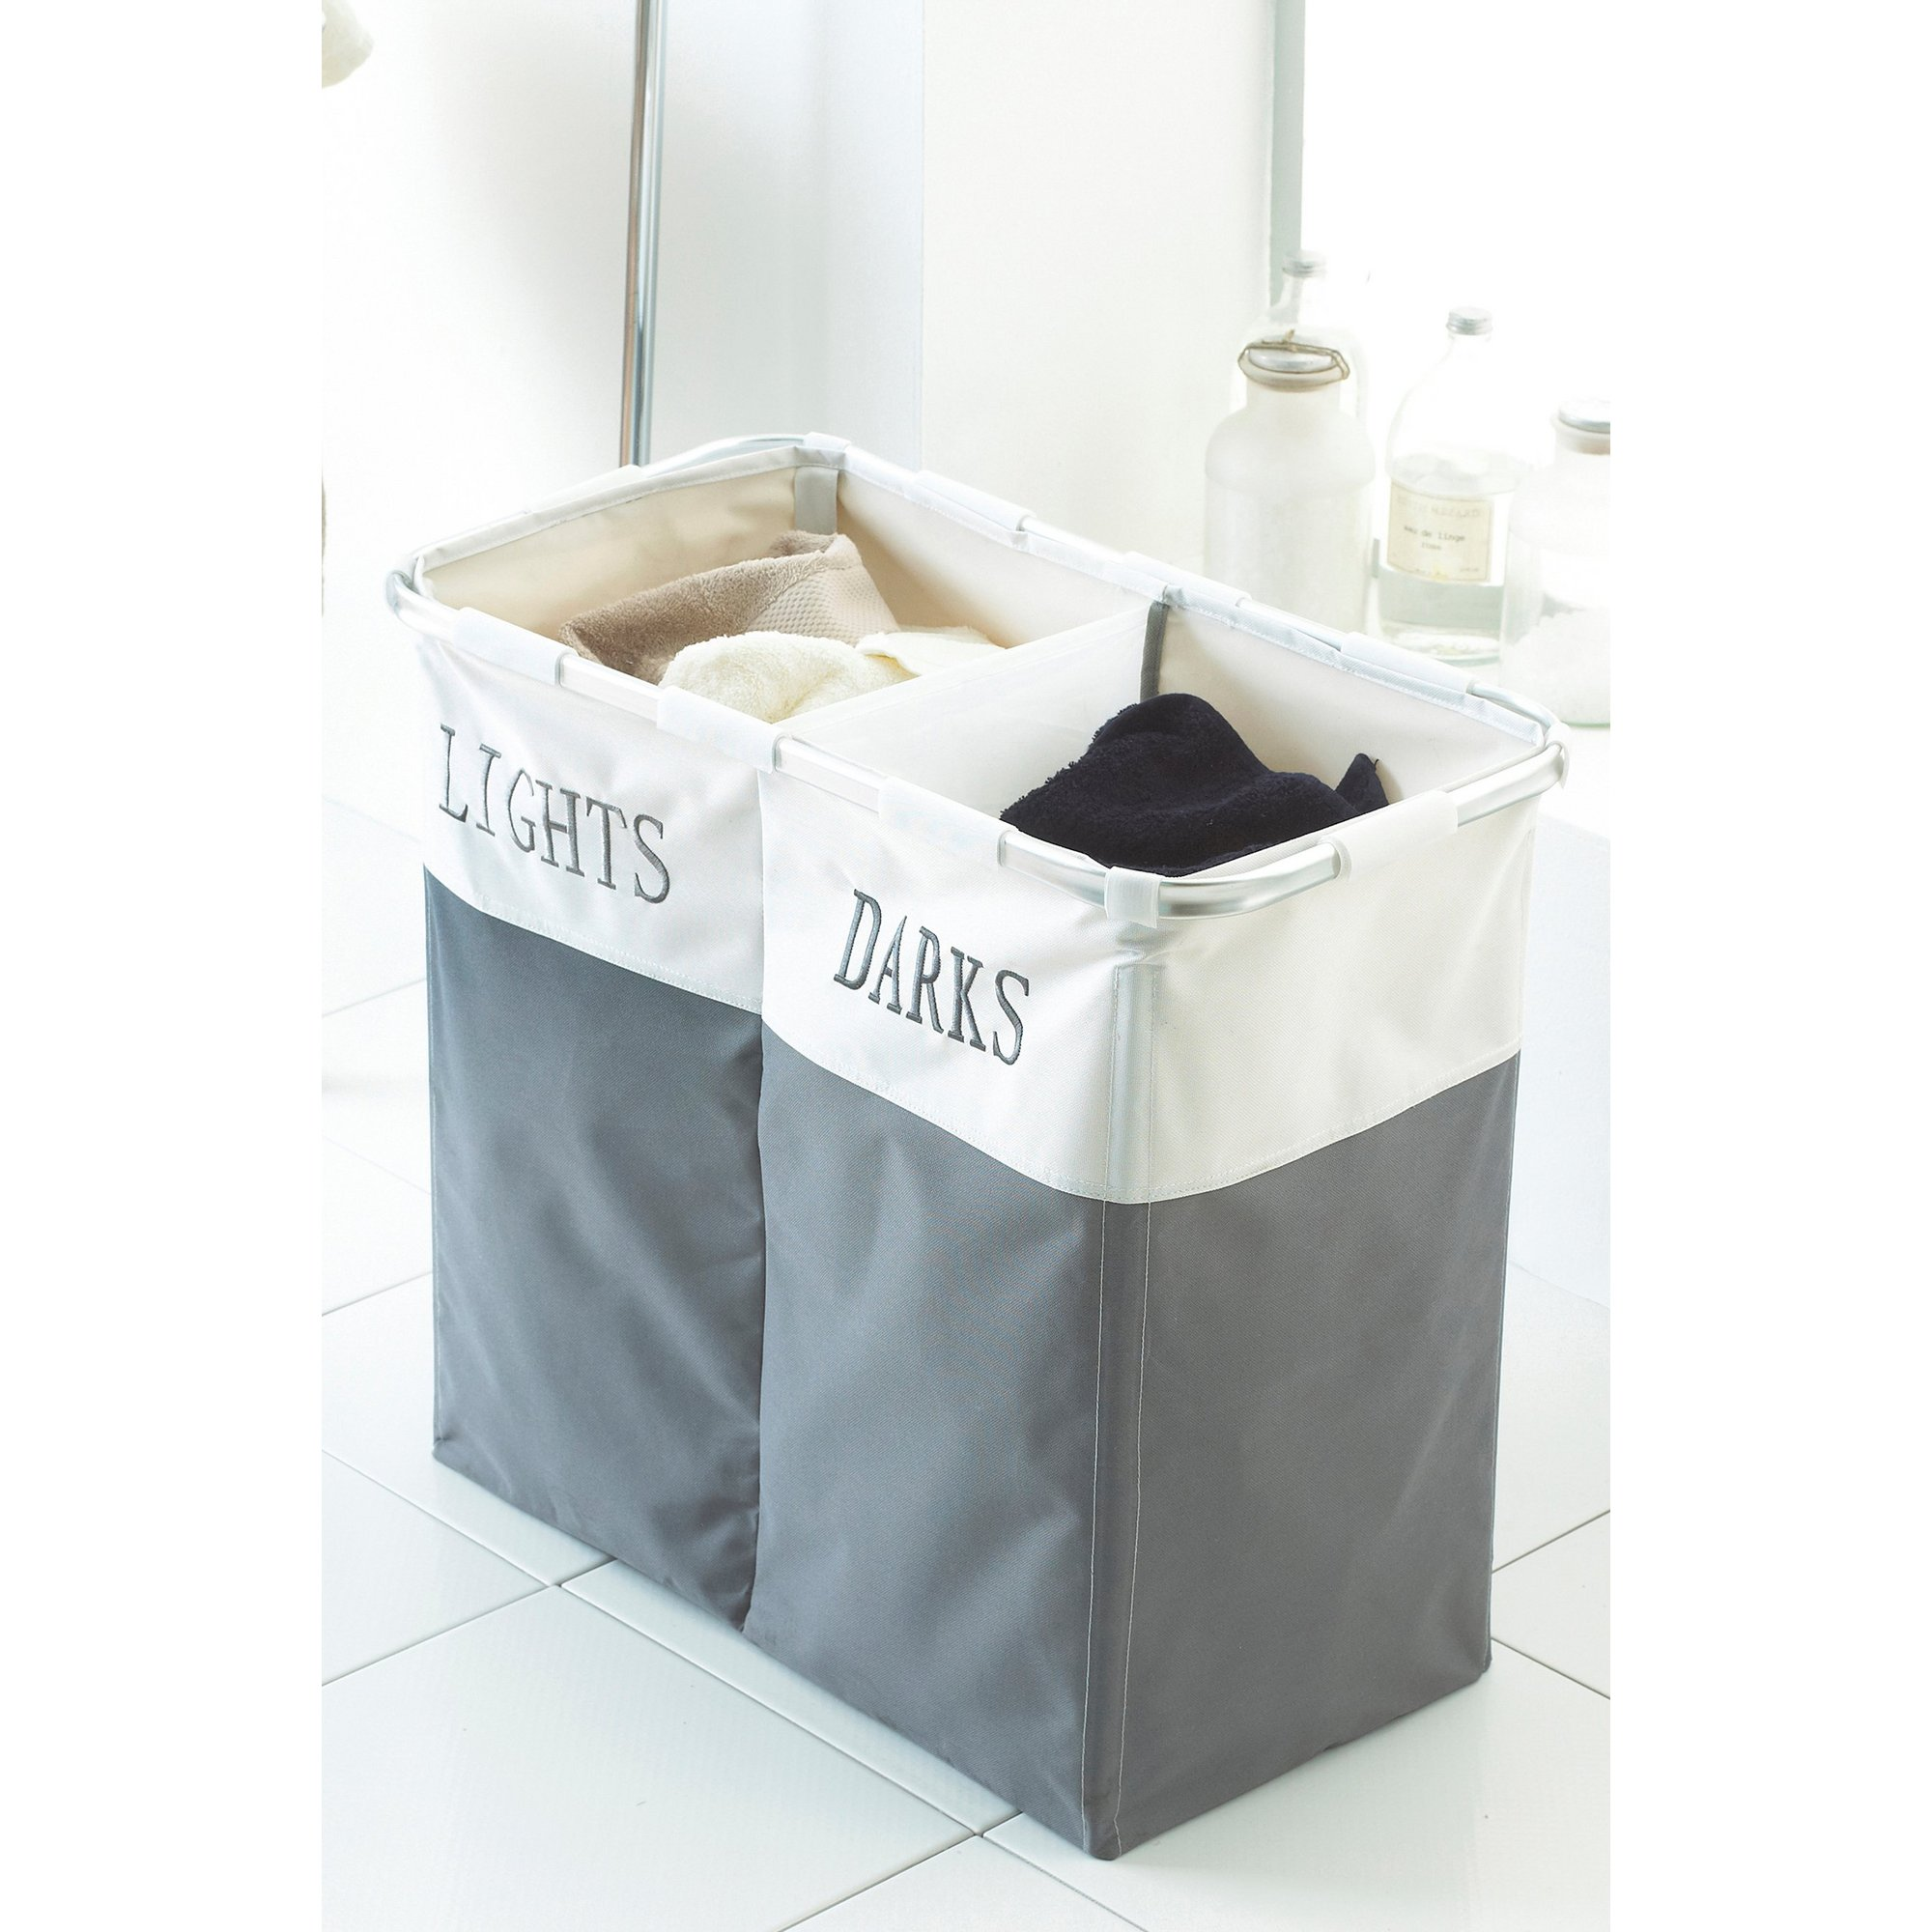 Image of Laundry Hamper Light and Dark